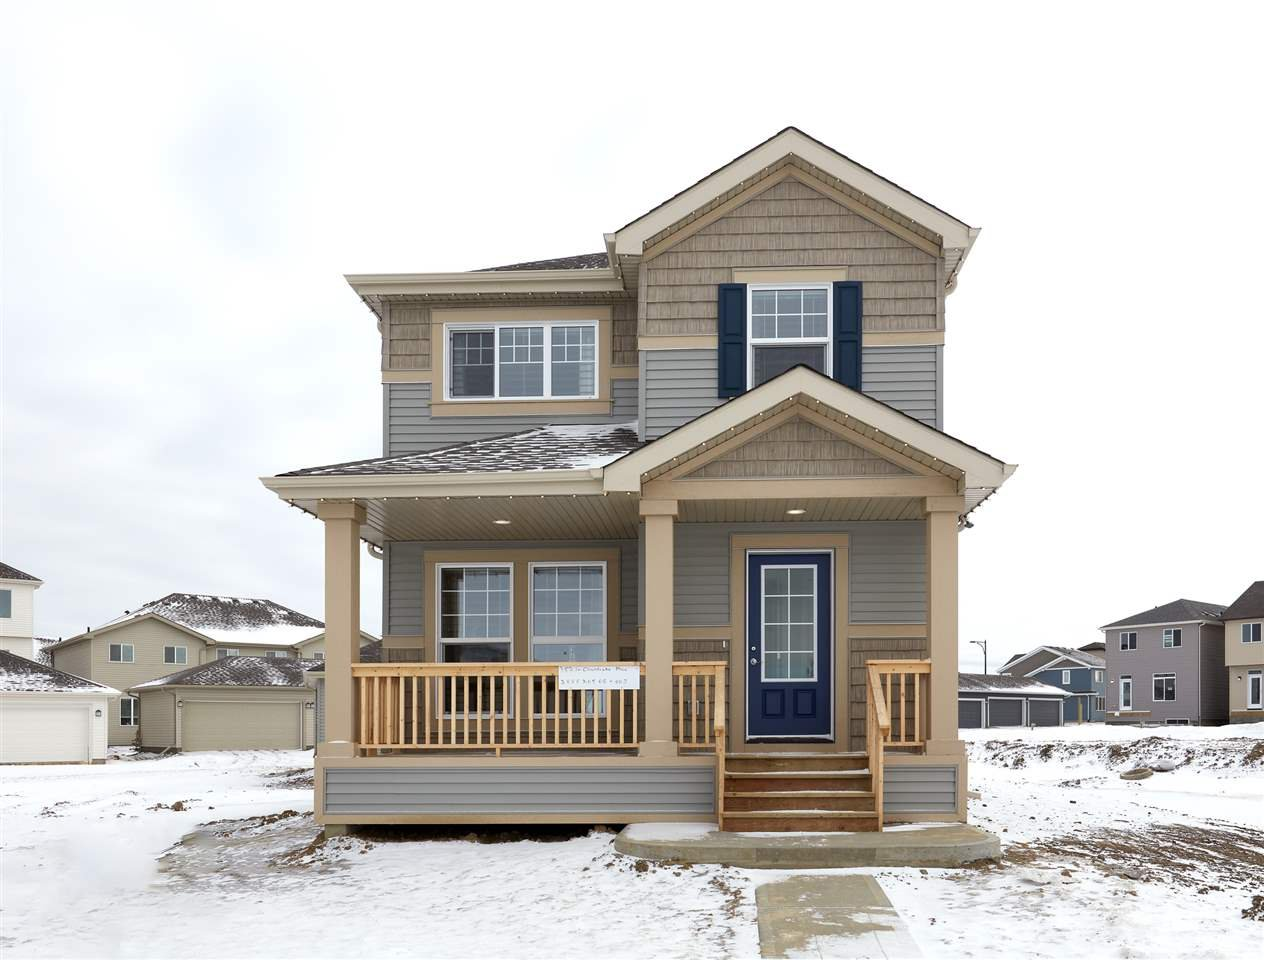 Main Photo: 3821 CHRUSTAWKA Place in Edmonton: Zone 55 House for sale : MLS®# E4185688